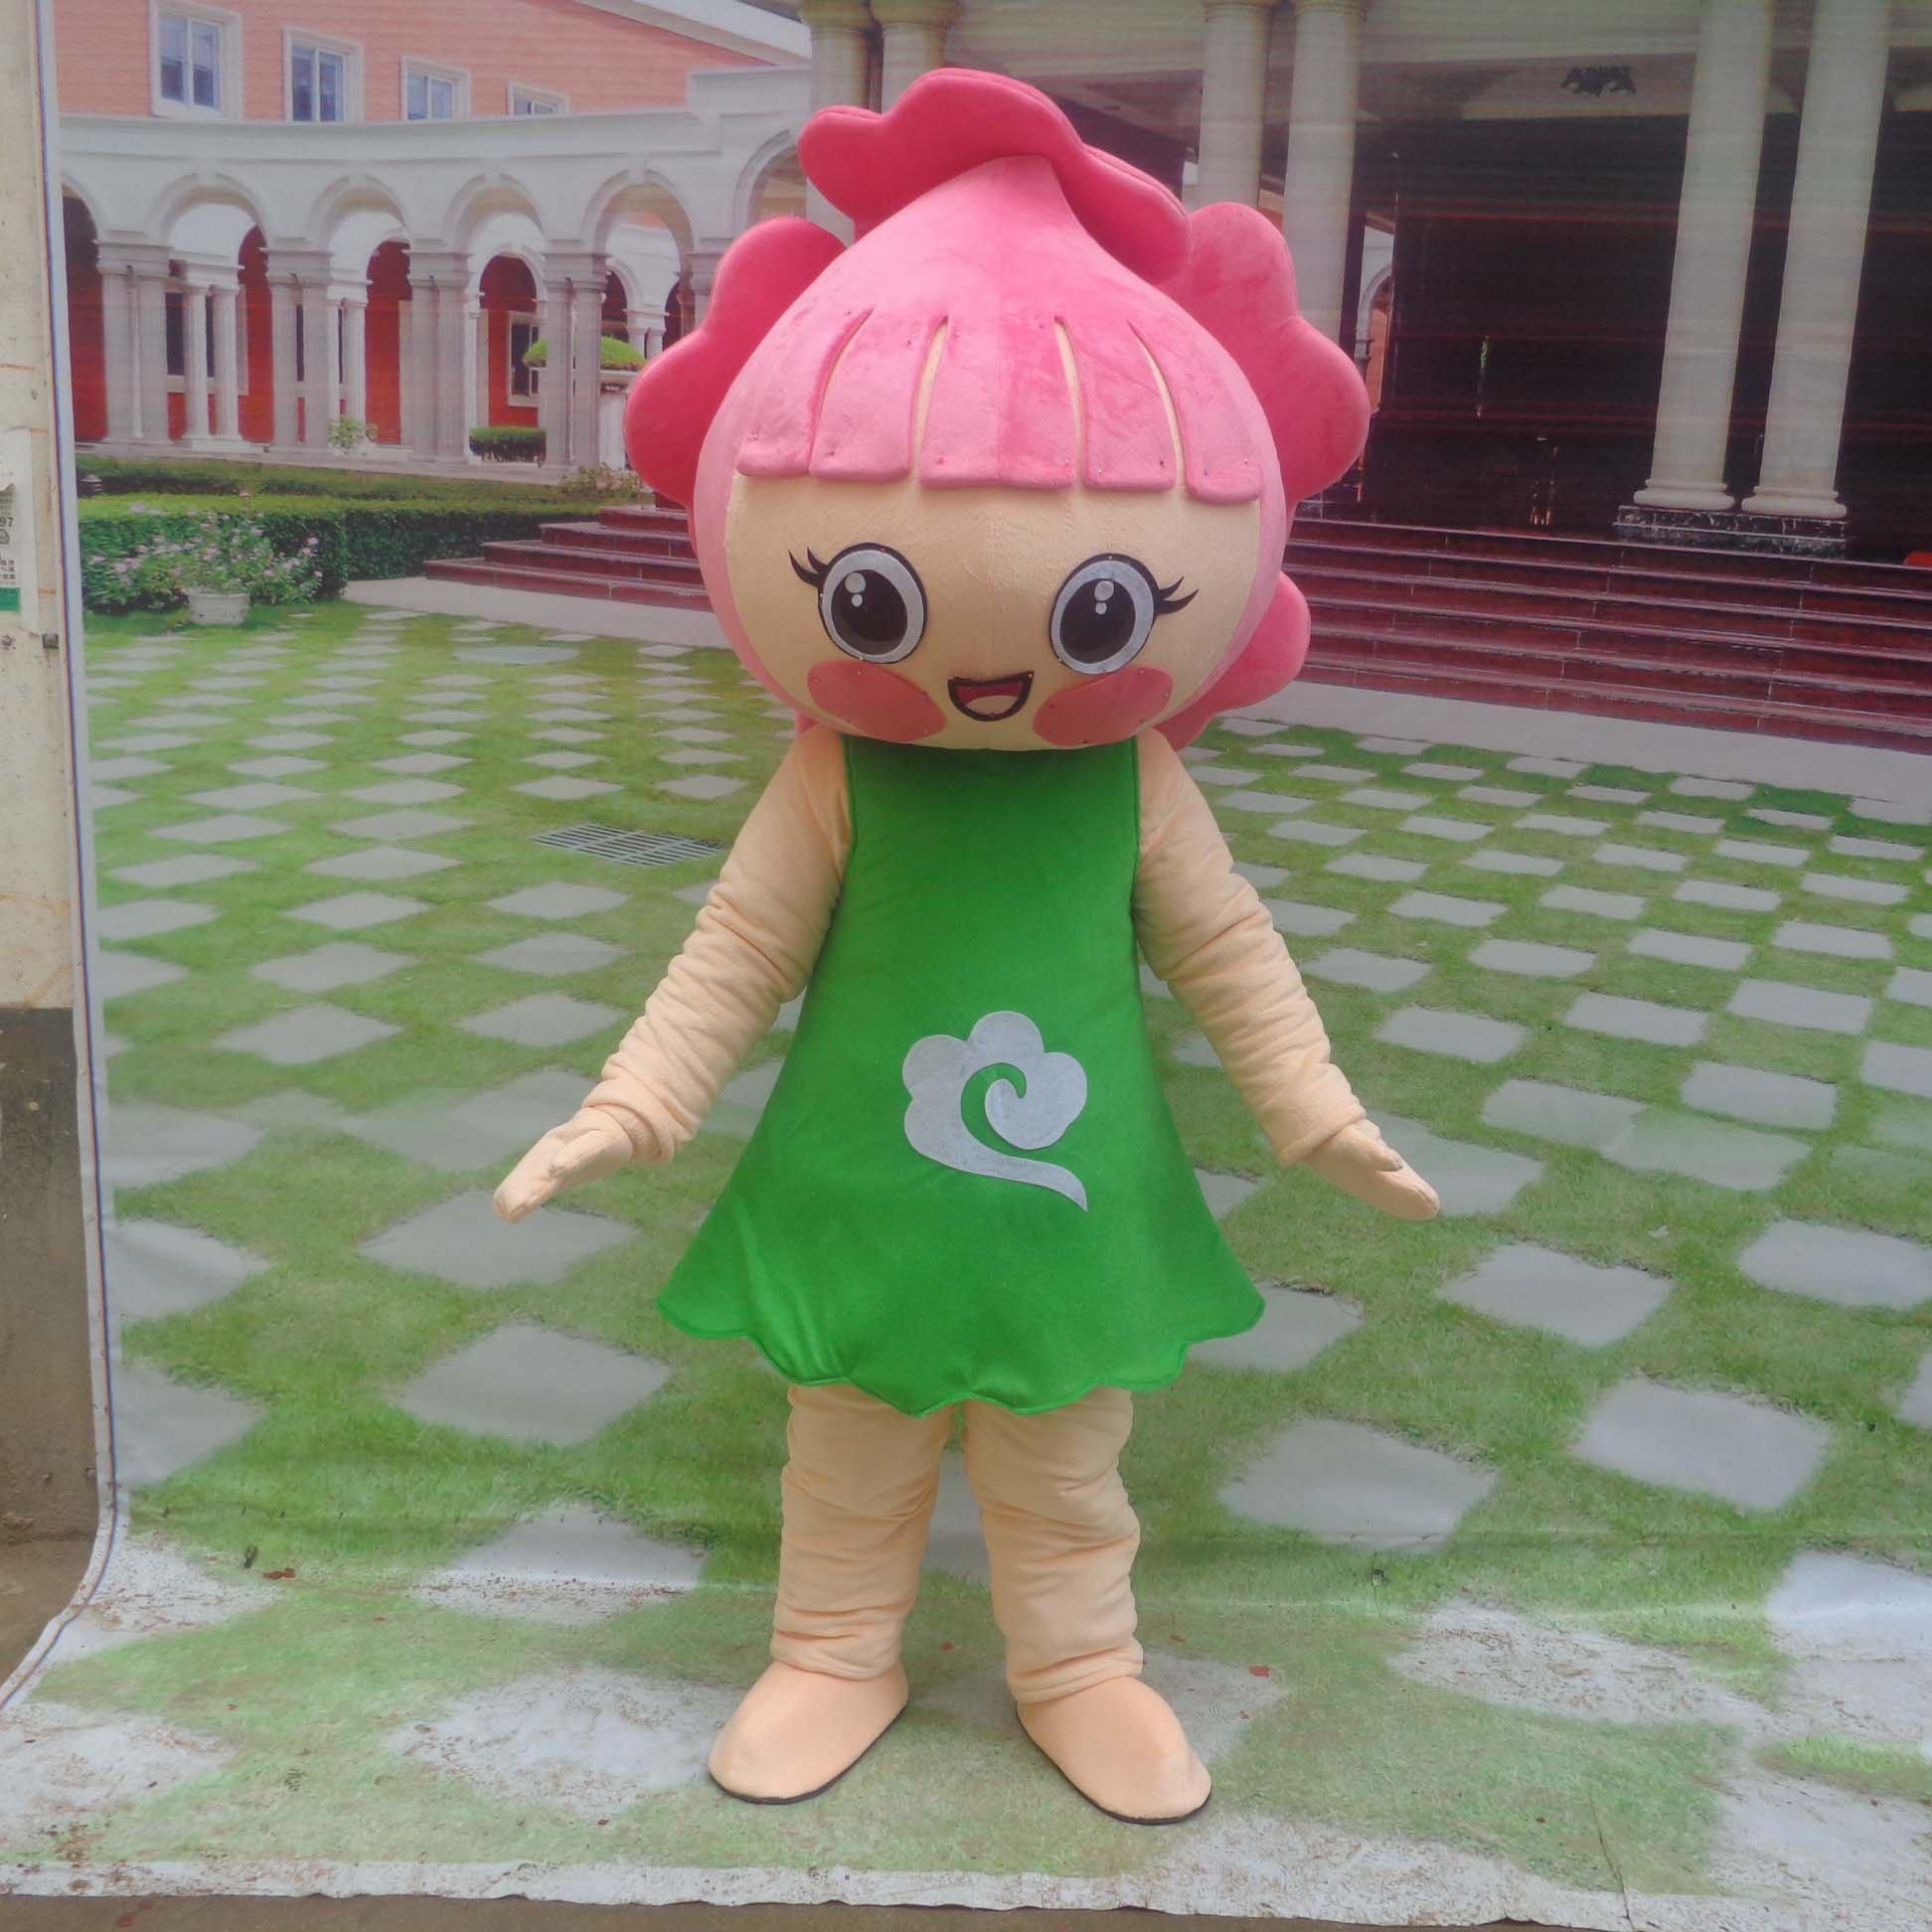 Peaches Peaches Walking Cartoon Doll Clothing Cartoon Costumes Performing Props Cartoon Dolls Peaches Mascot Costume